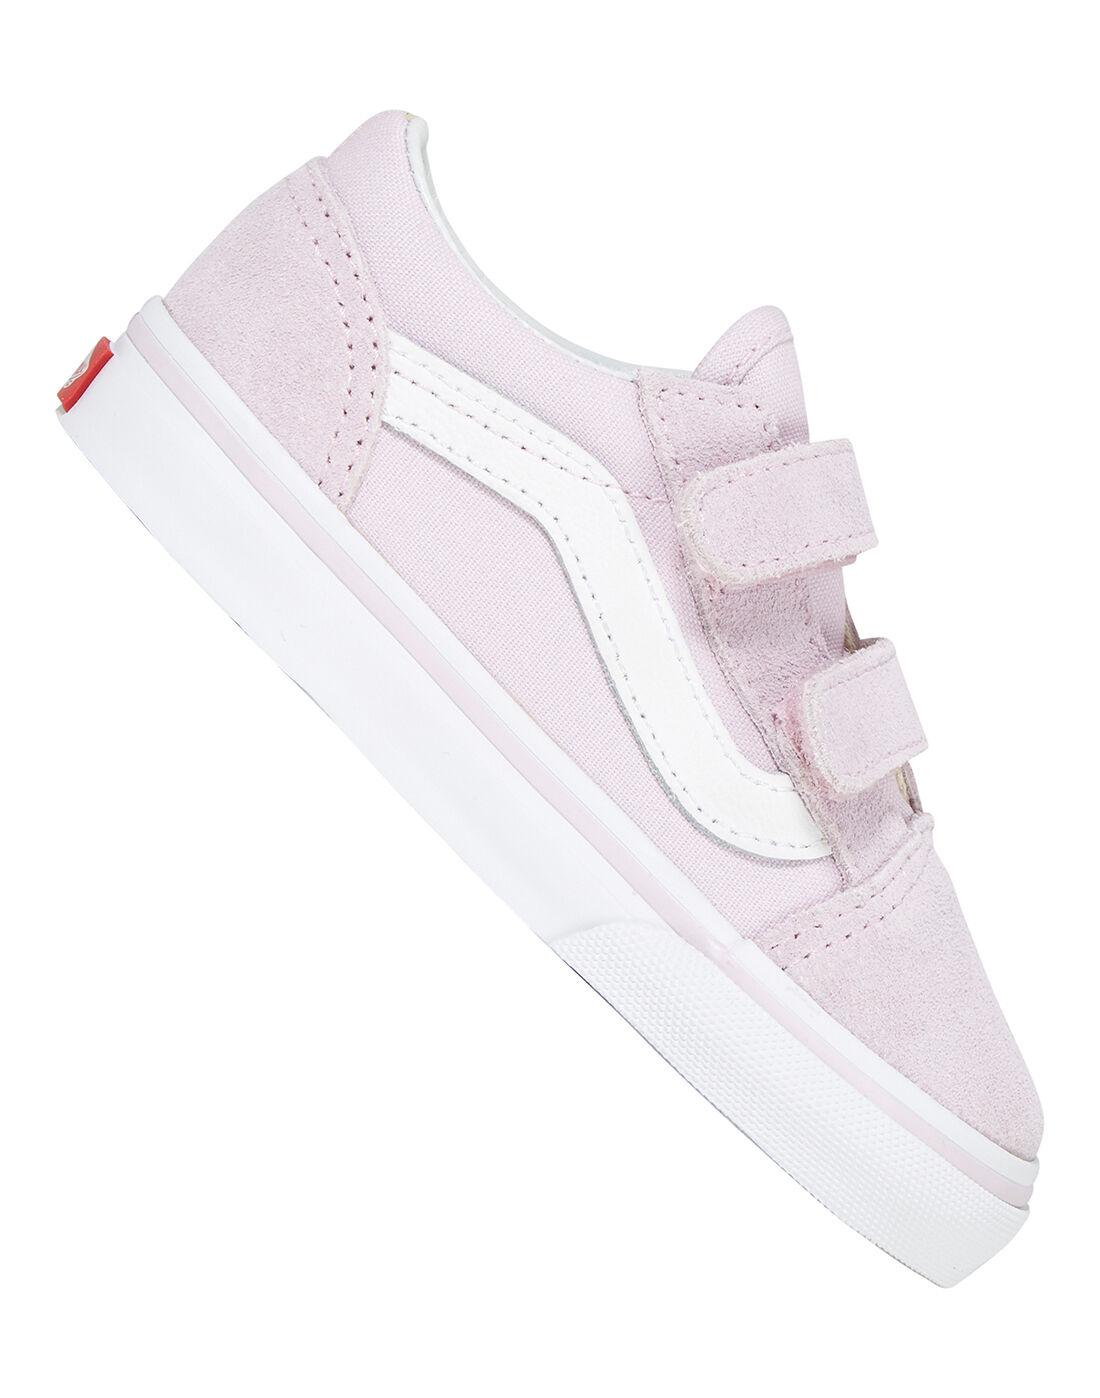 Infant Girl's Pink Old Skool Vans